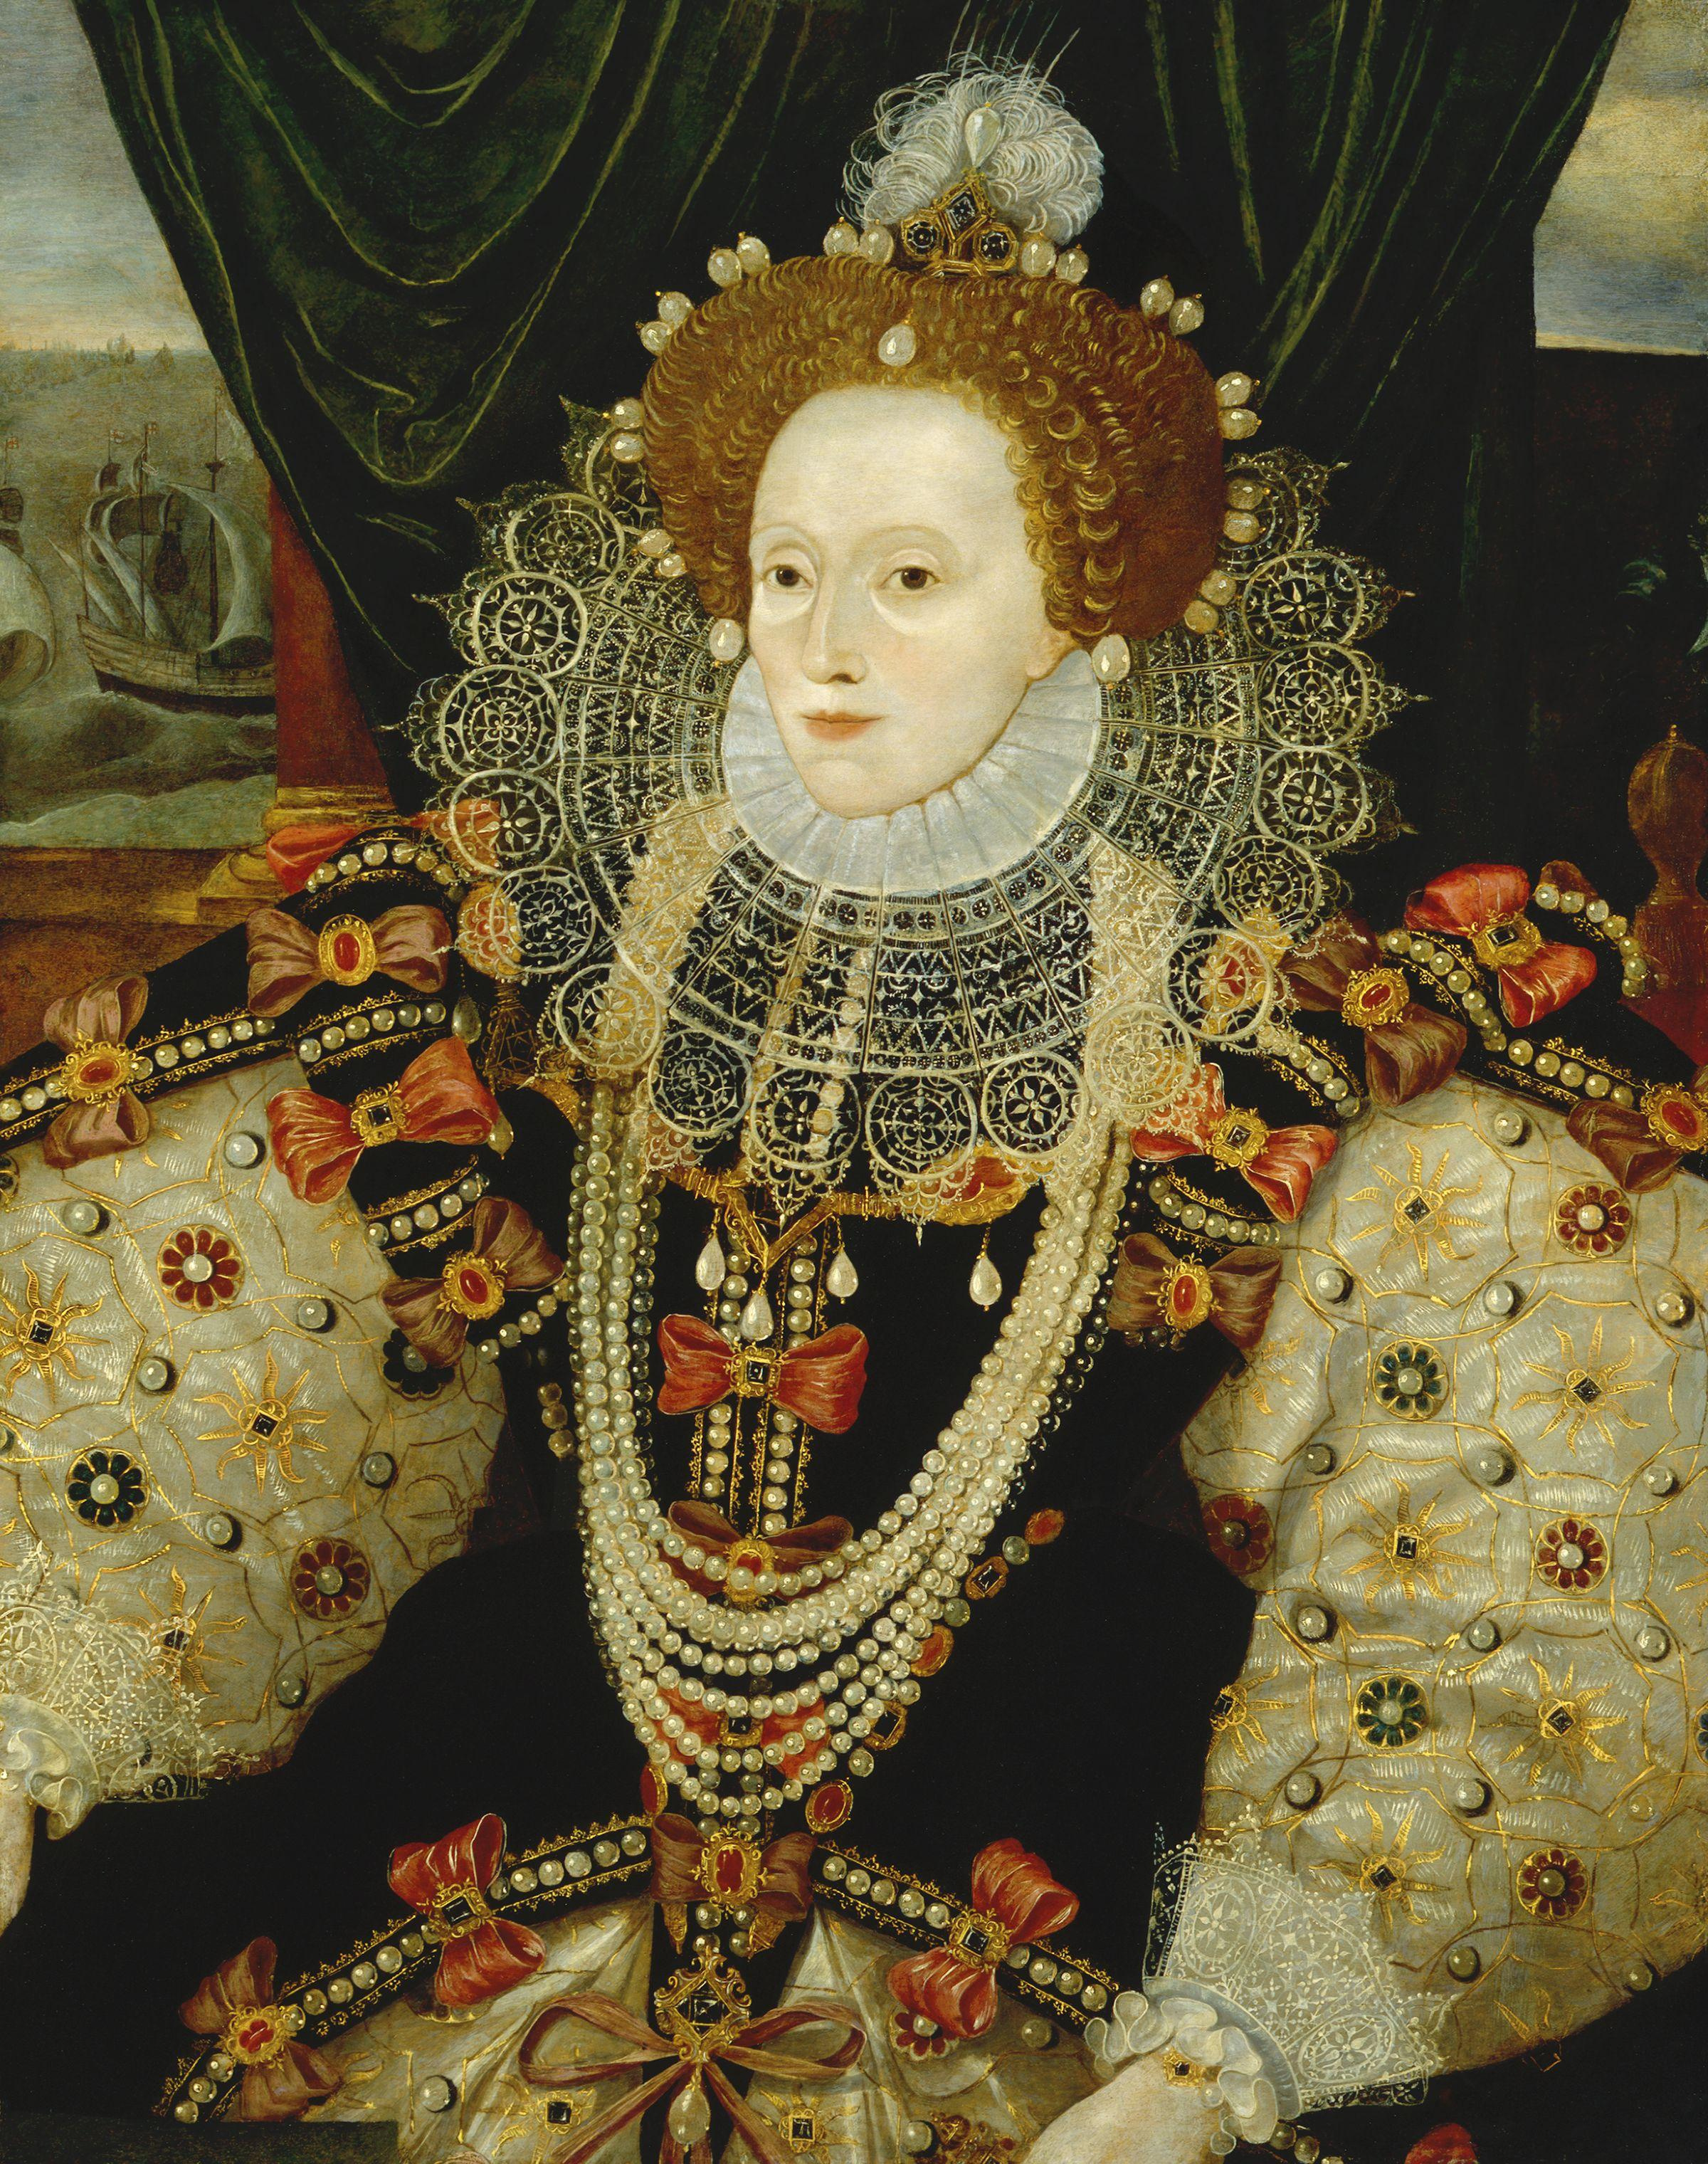 queen elizabeth speech to the troops at tilbury